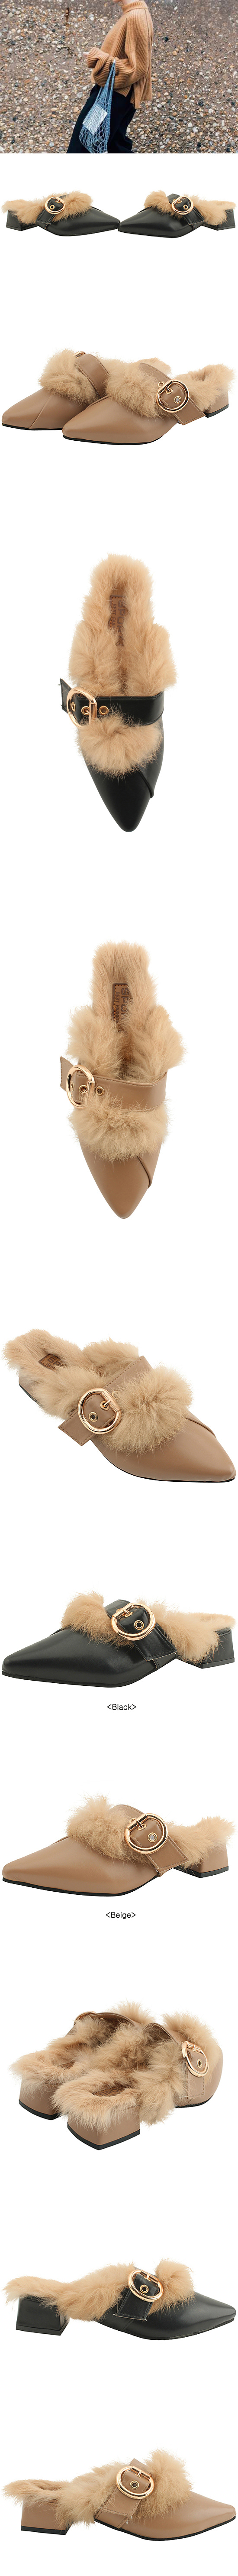 Levit Fur Pointed Nose Mary Jane Blocker Black